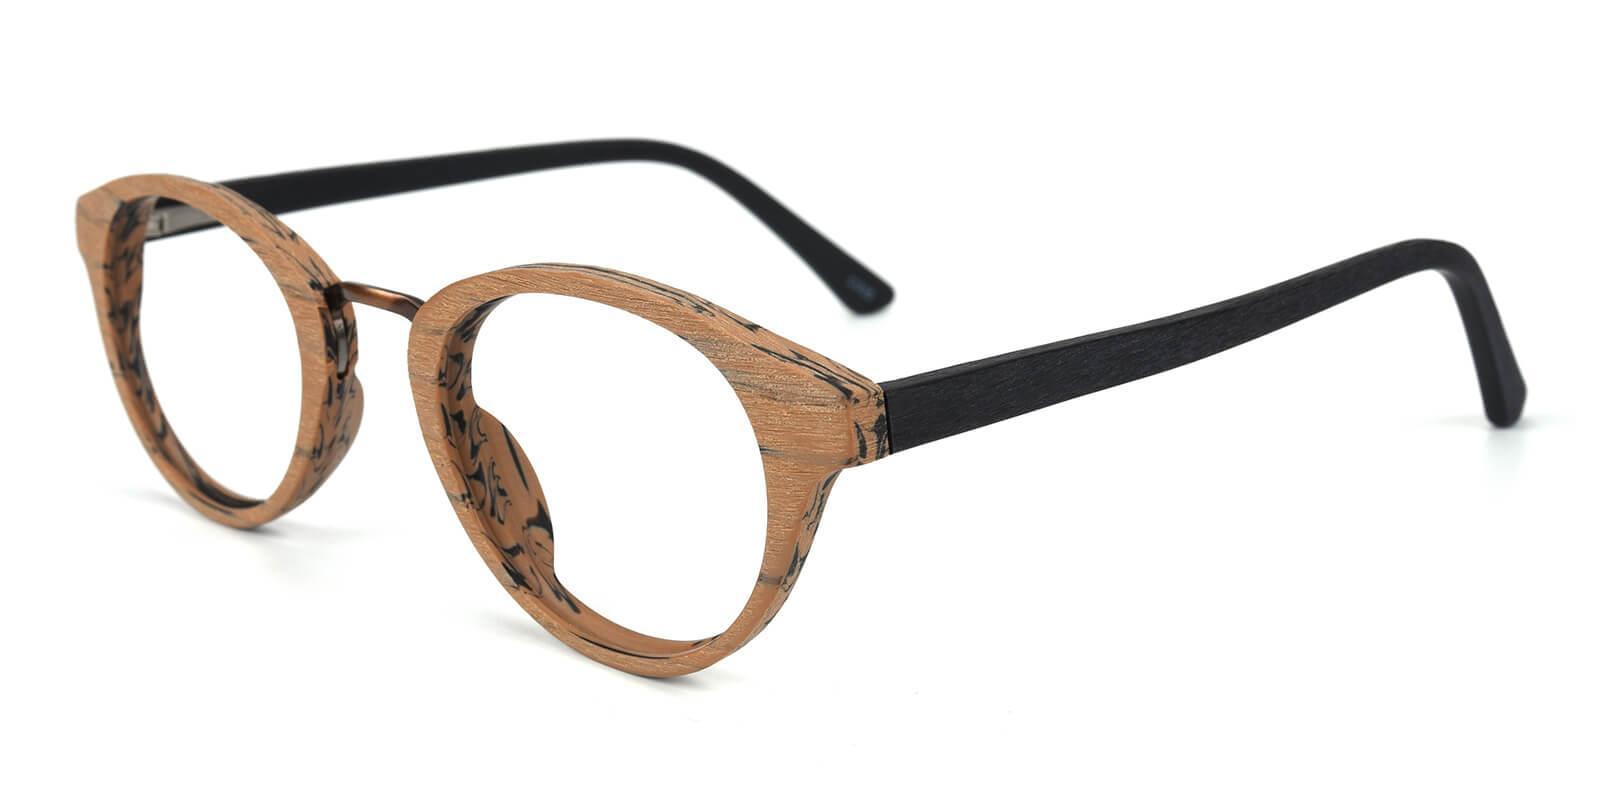 Haiden-Cream-Oval-Acetate-Eyeglasses-additional1